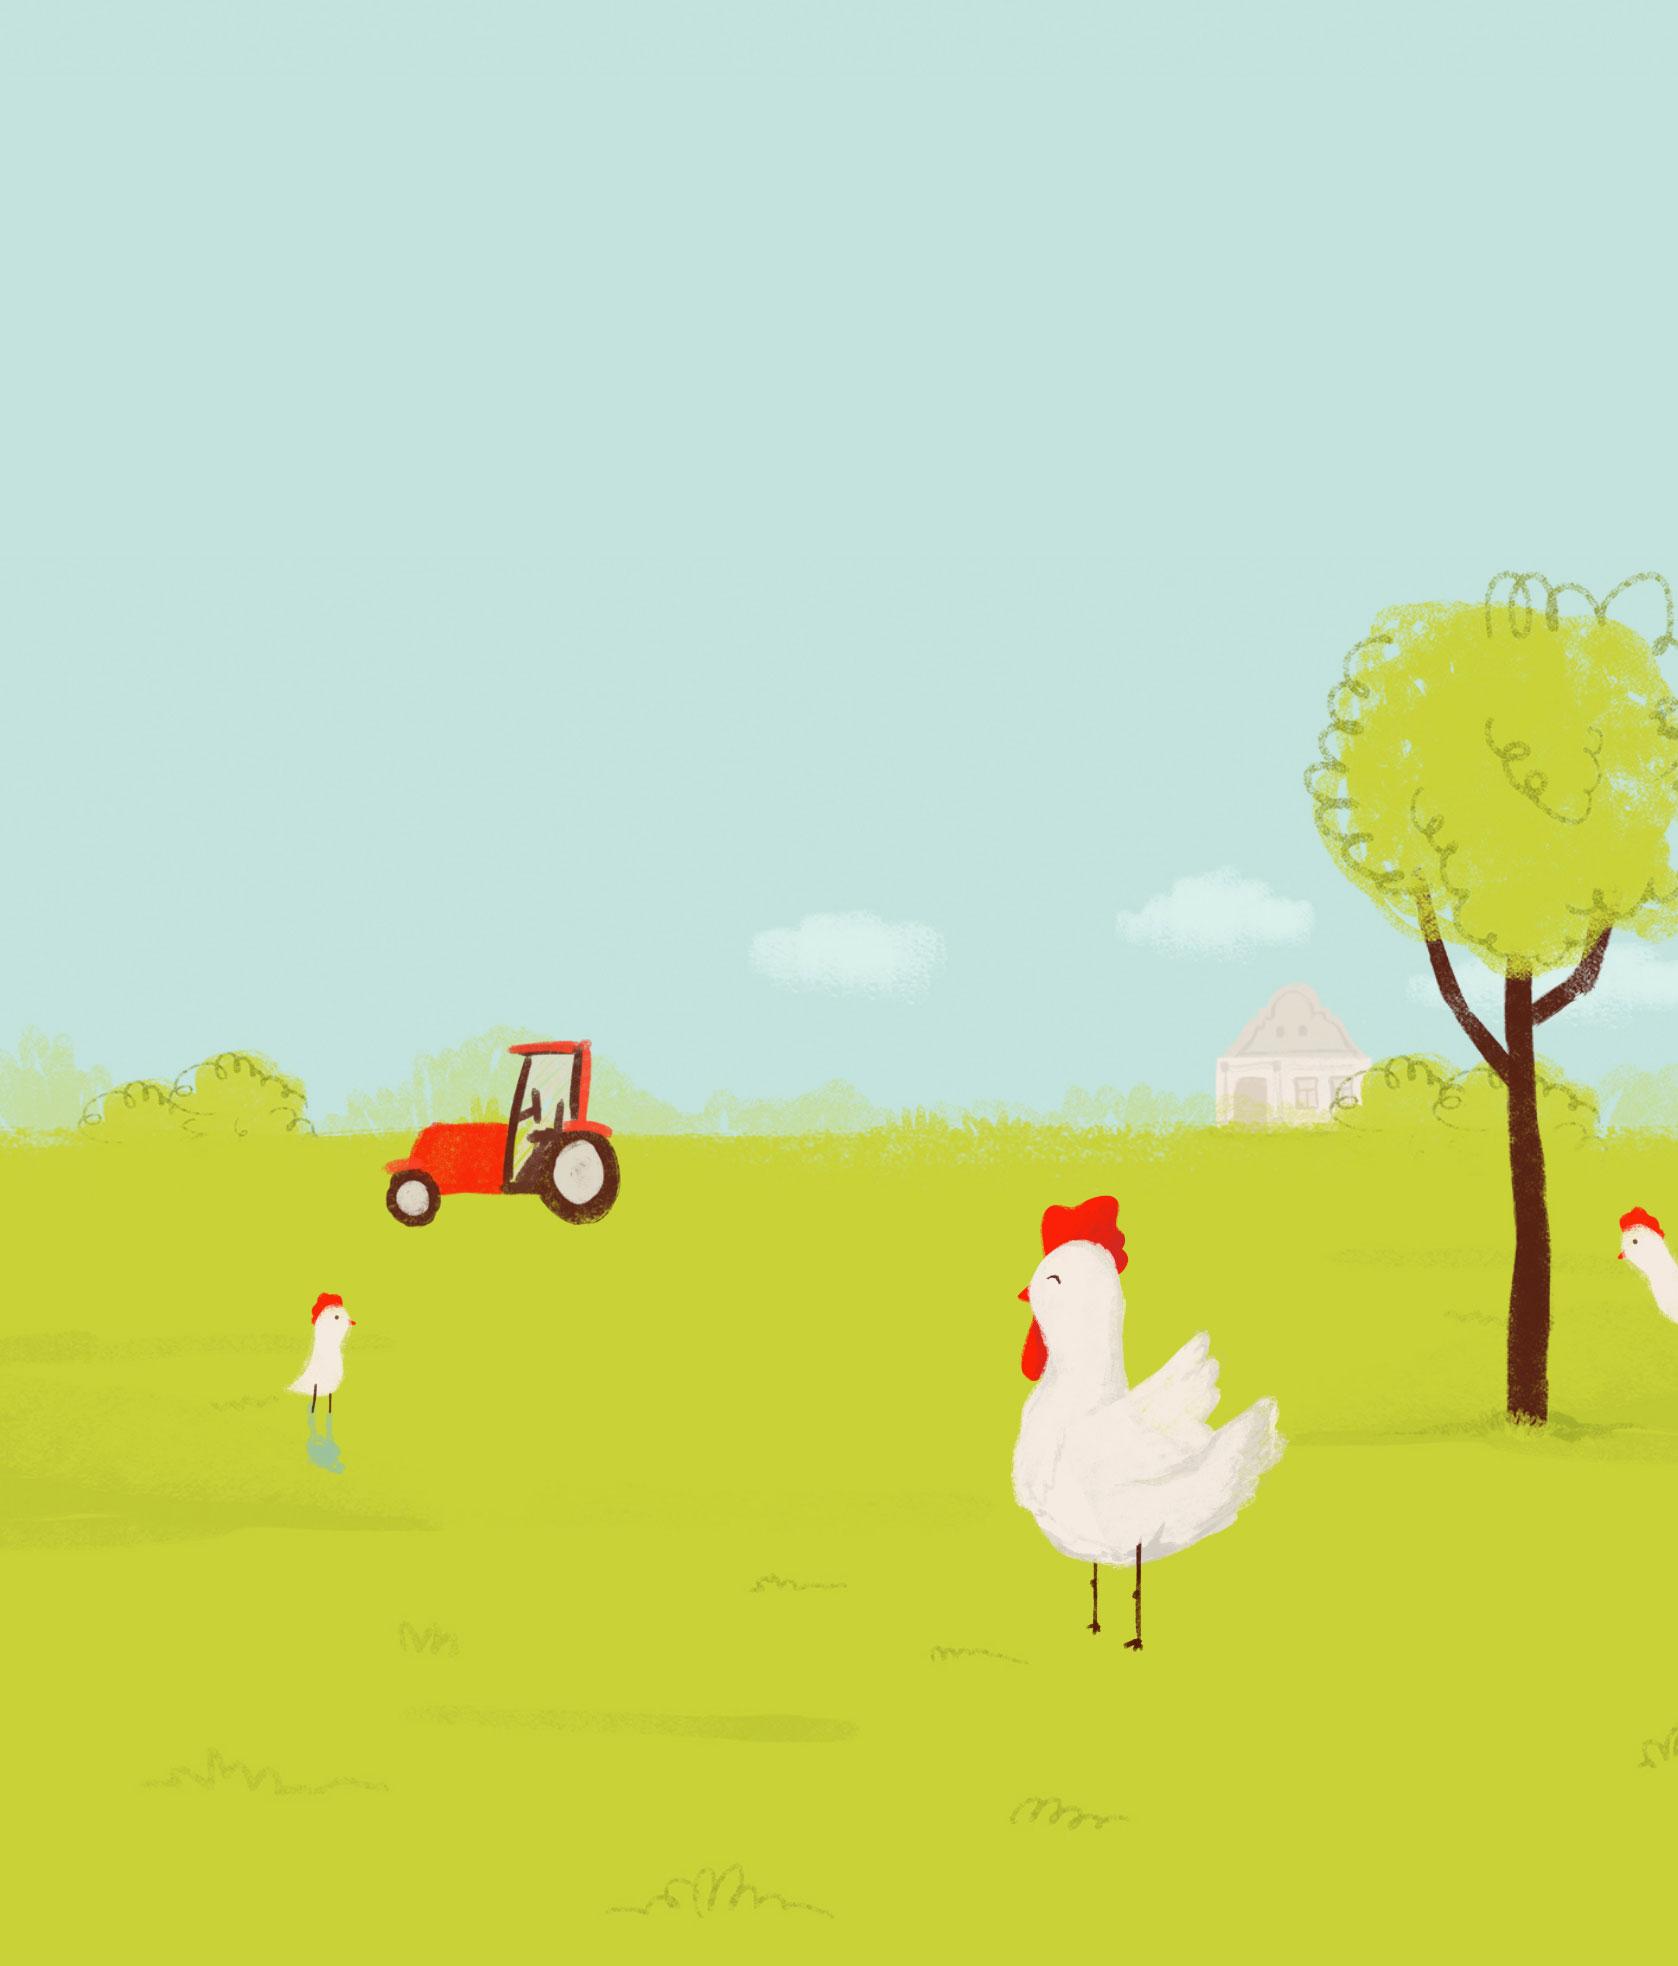 avramovic farm ilustration